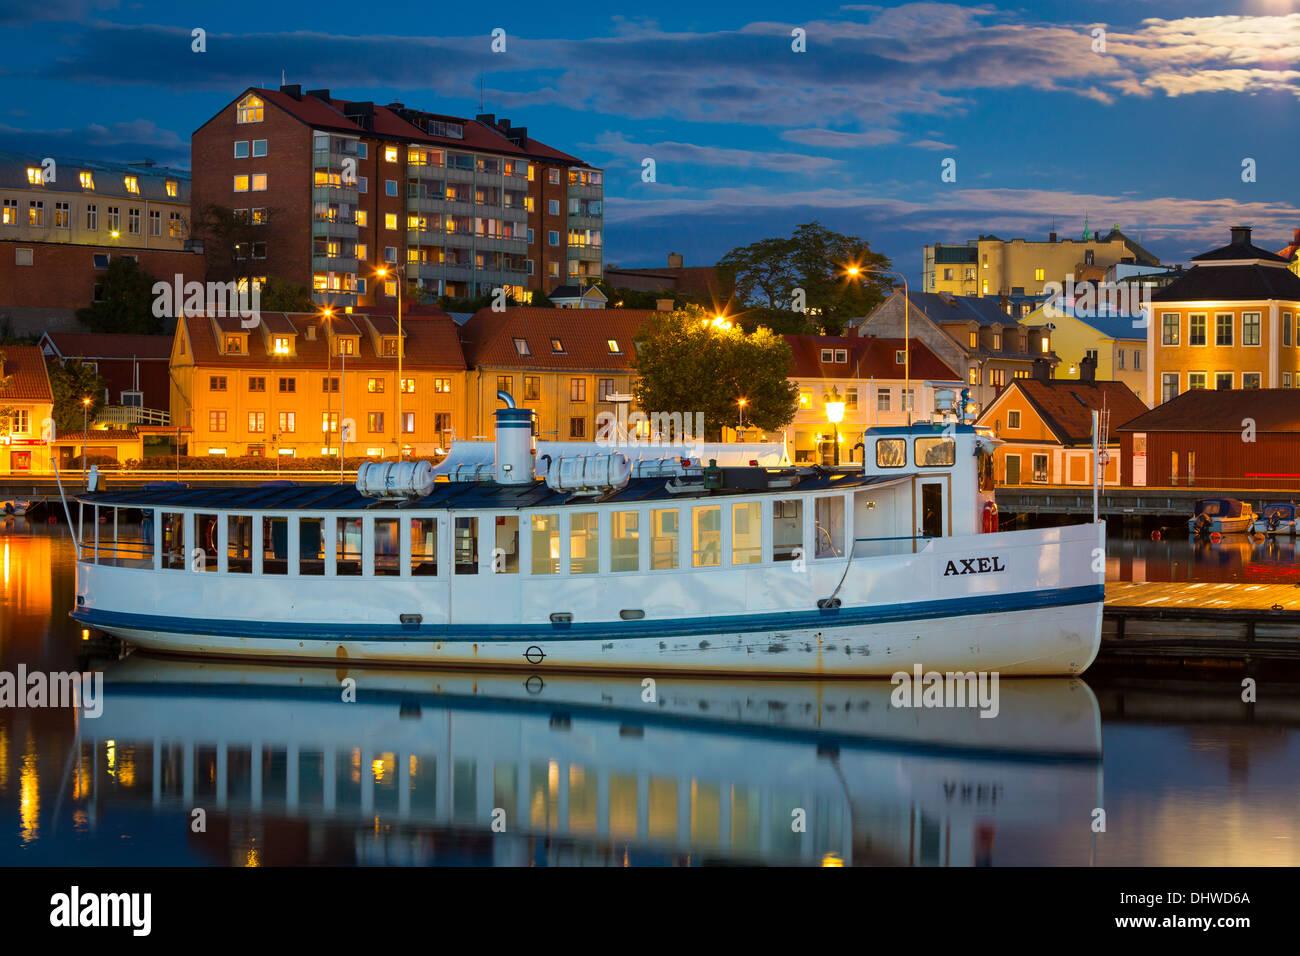 Vintage ferry 'Axel' in Karlskrona, Sweden - Stock Image